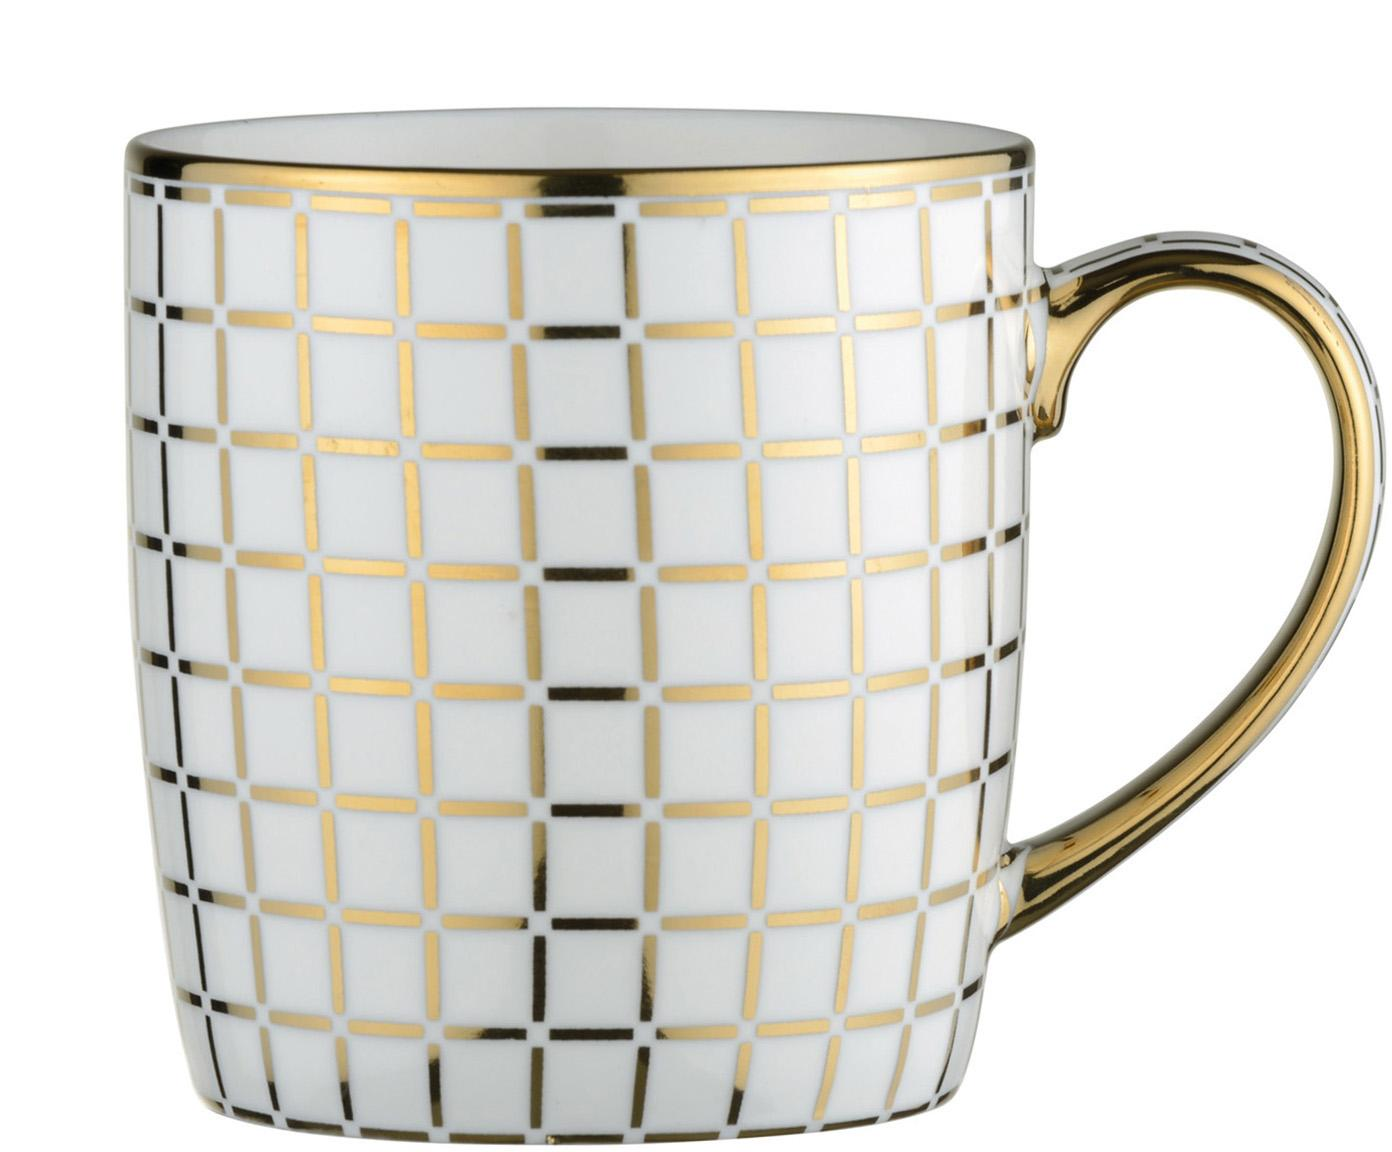 Tassen Lattice, 4 Stück, Porzellan, Weiss, Goldfarben, Ø 9 x H 10 cm